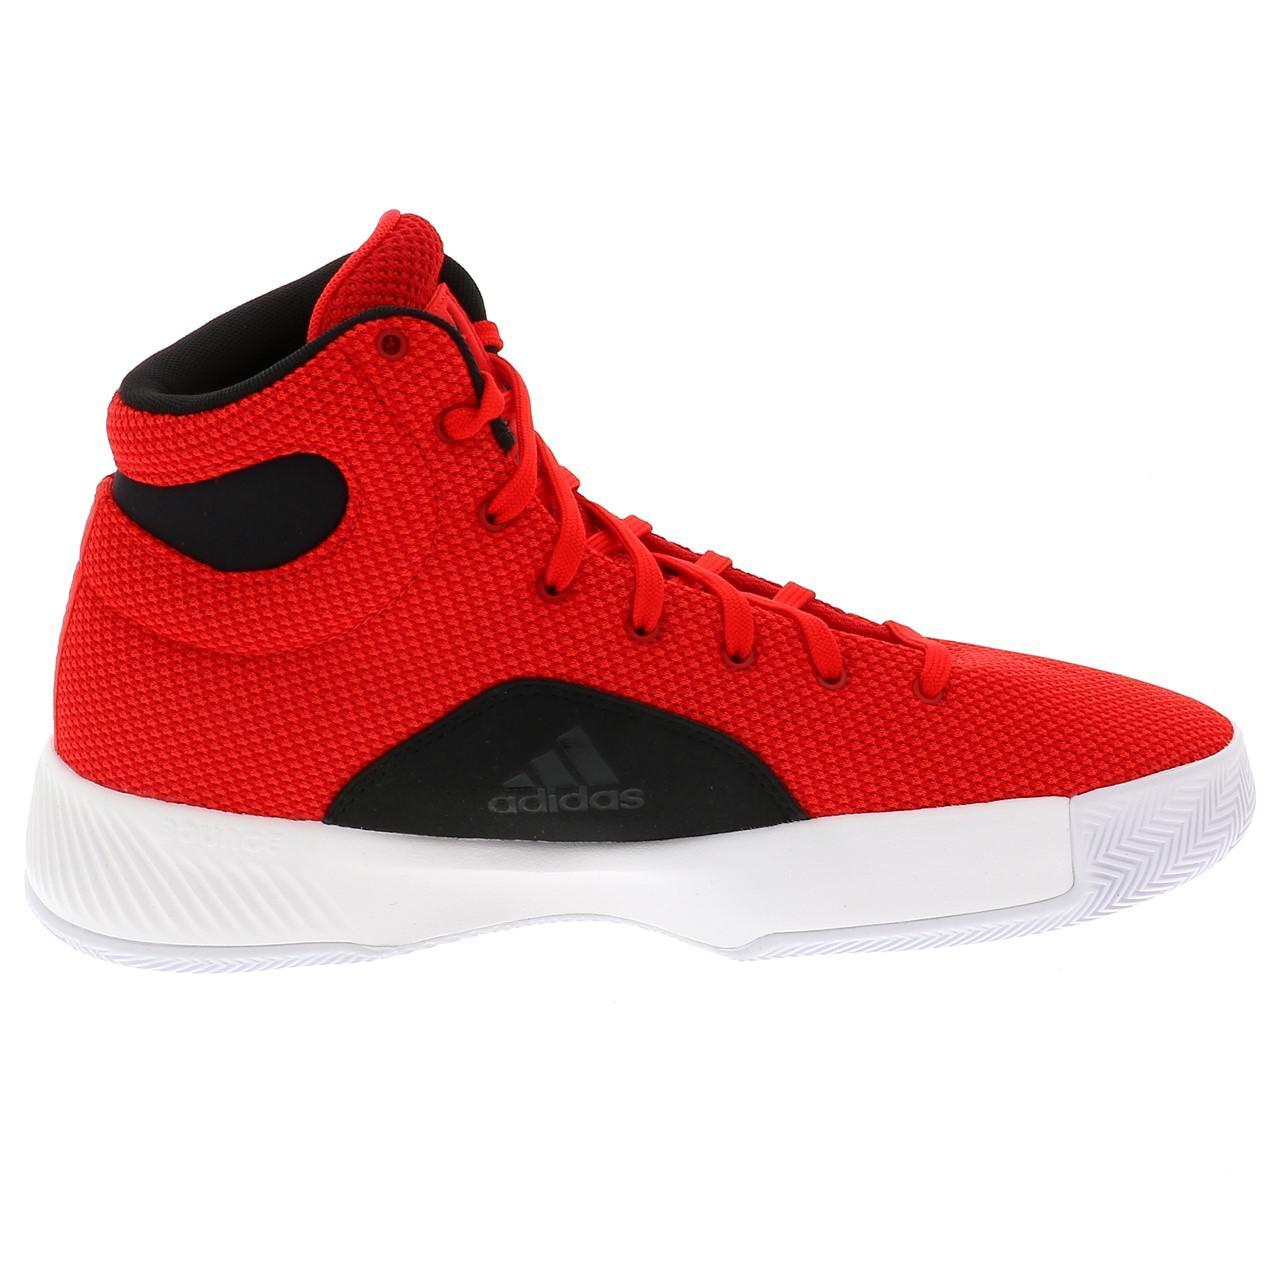 Chaussures-basket-Adidas-Pro-bounce-madness-basket-Rouge-55000-Neuf miniature 4